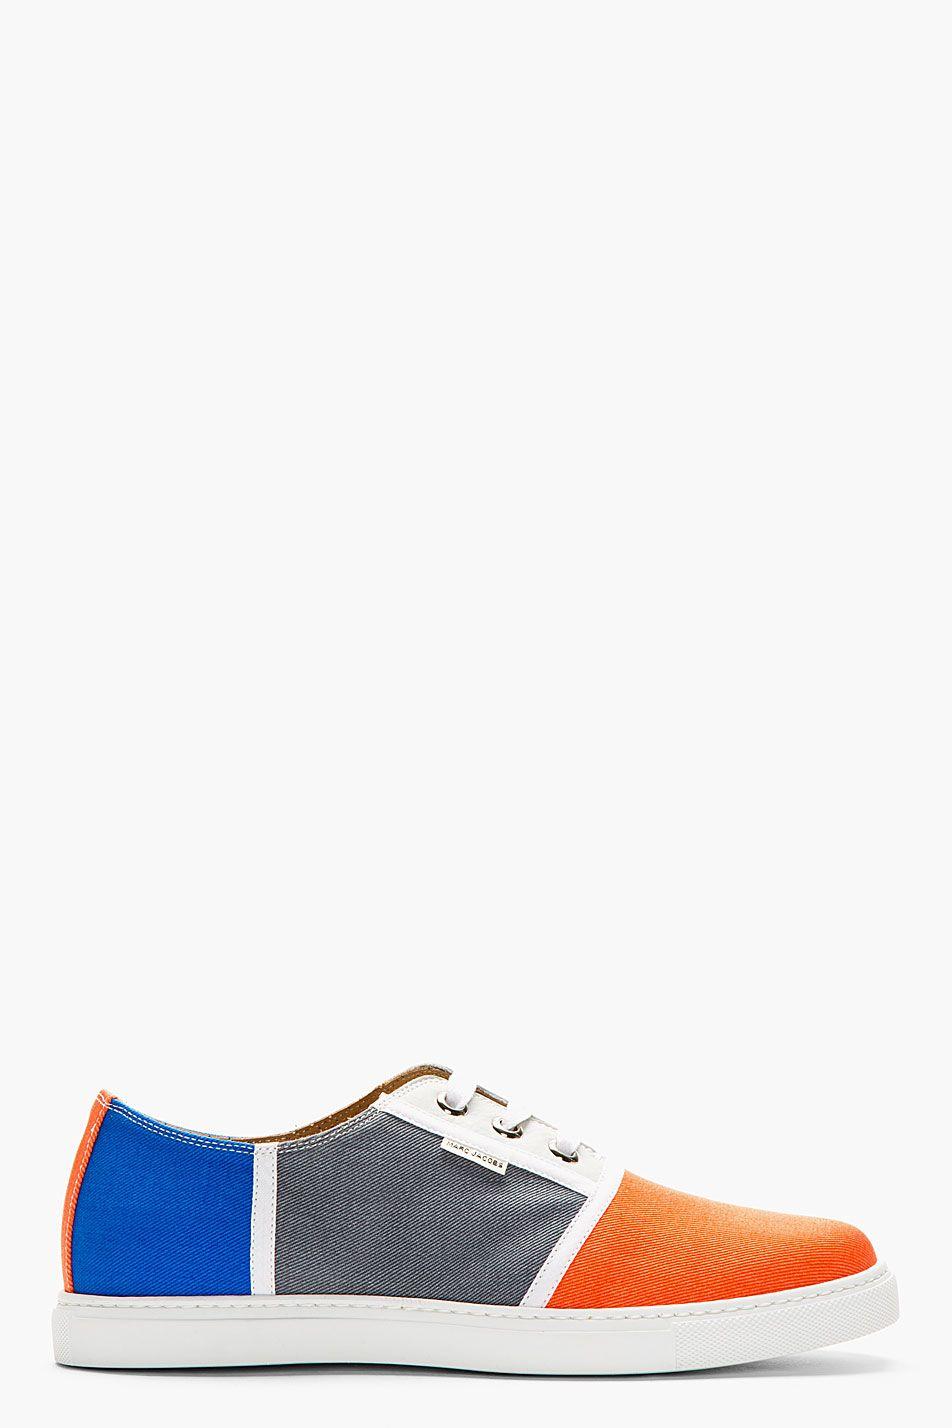 MARC JACOBS Blue & Orange Colorblocked Sneakers